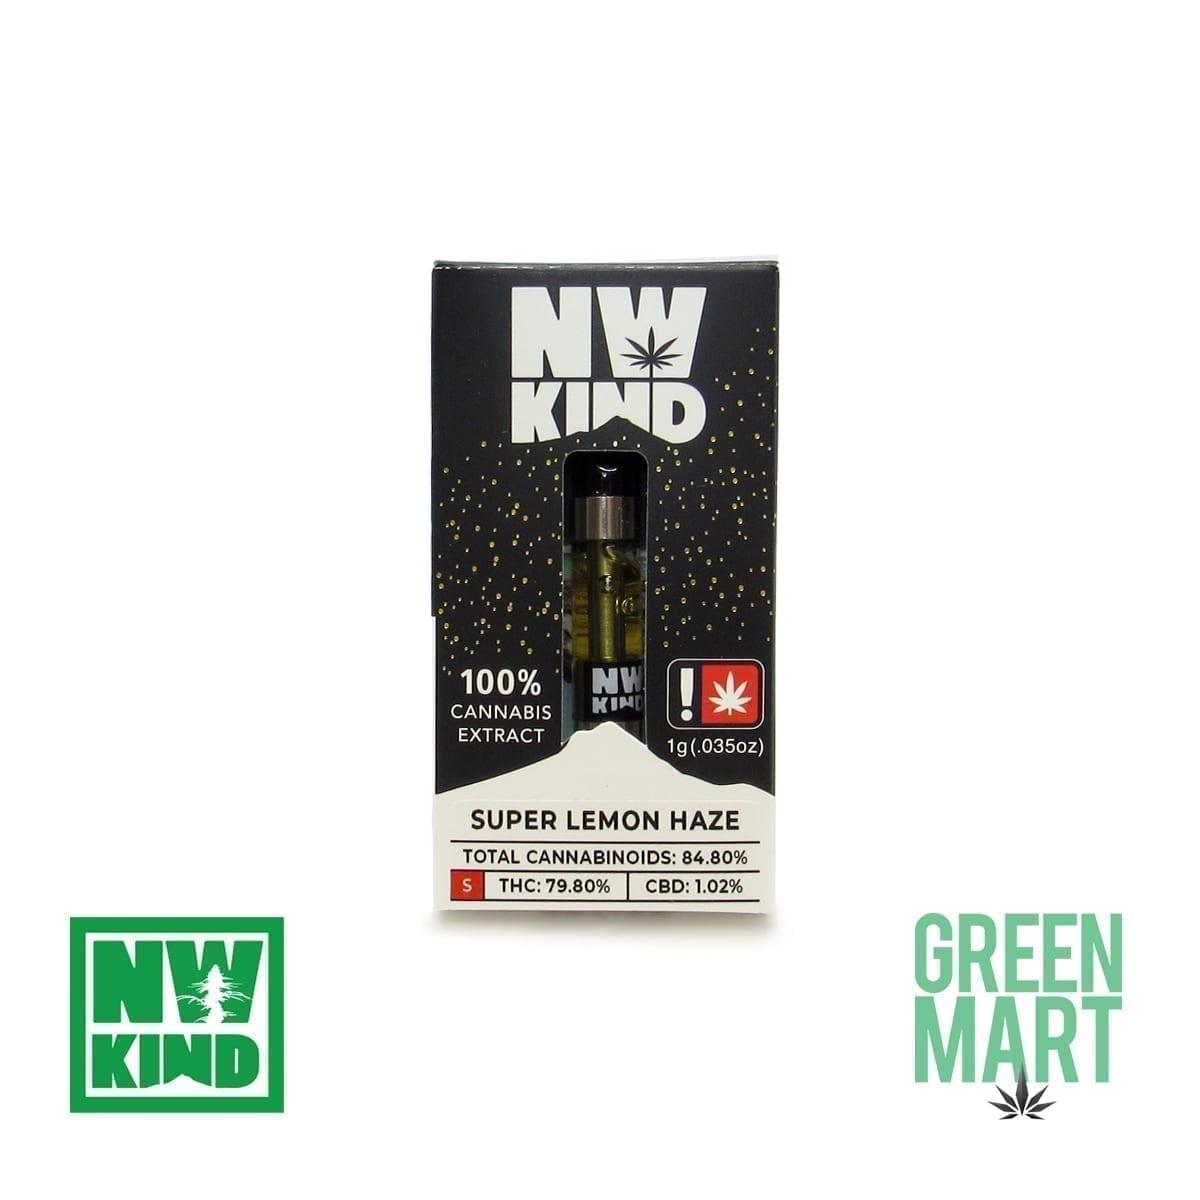 NW Kind Distillate Cartridge - Super Lemon Haze